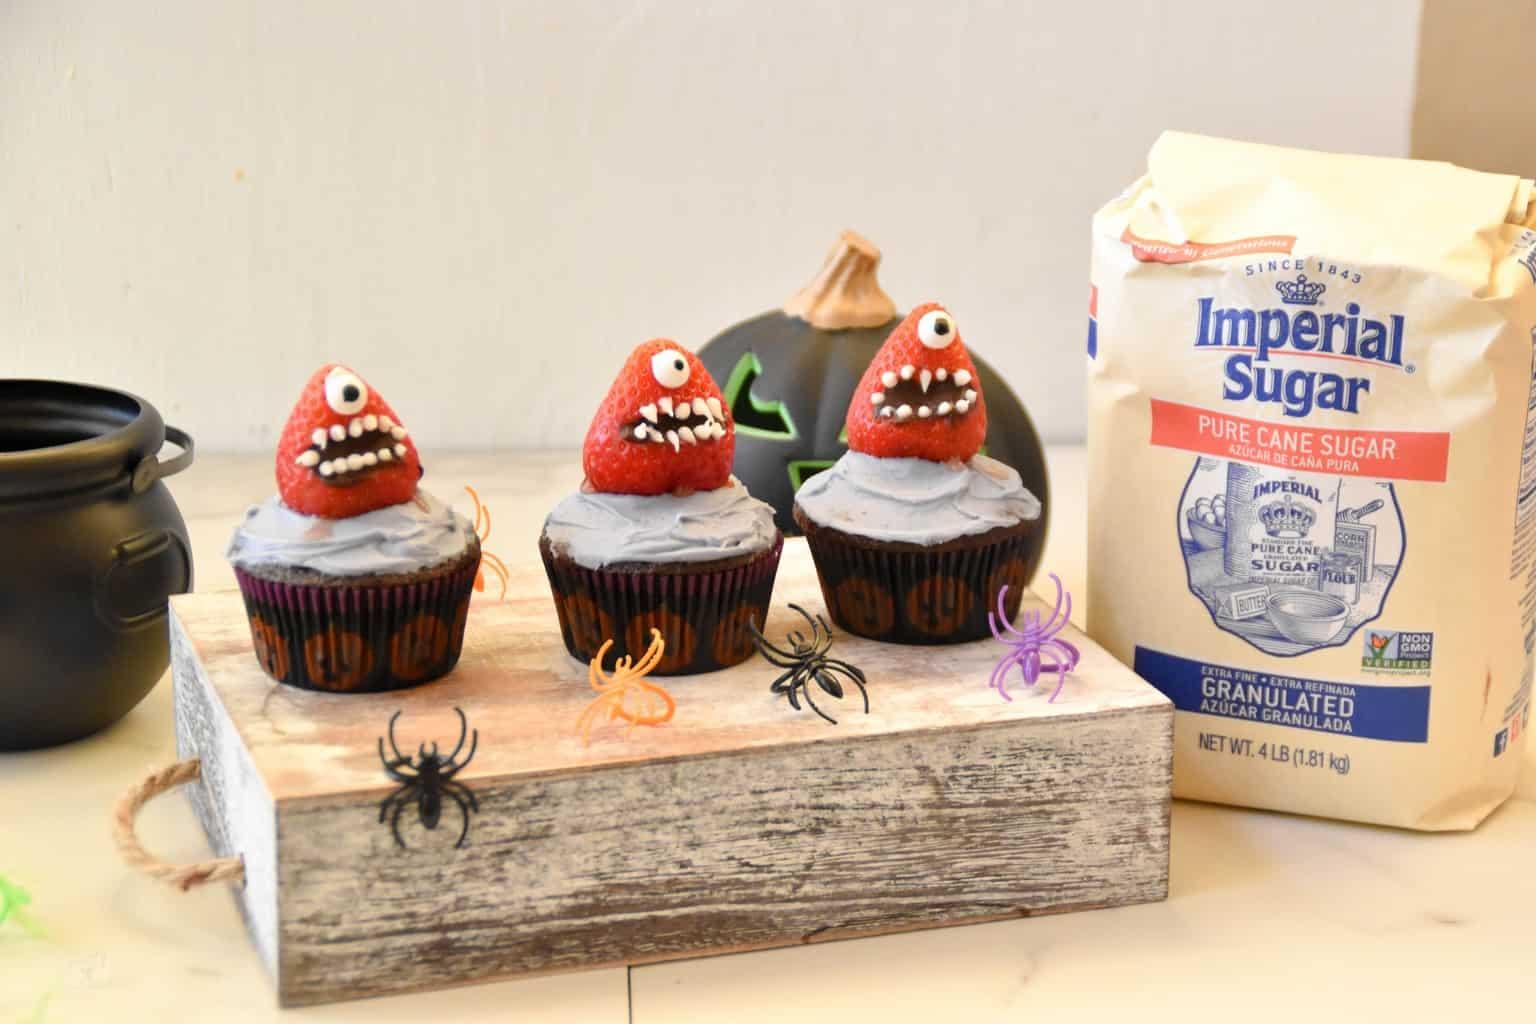 "<img src=""https://cdn.shortpixel.ai/client/q_glossy,ret_img,w_4096,h_2730/Halloween cupcakes.jpg"" alt=""Strawberry Monster Cupcakes "">"